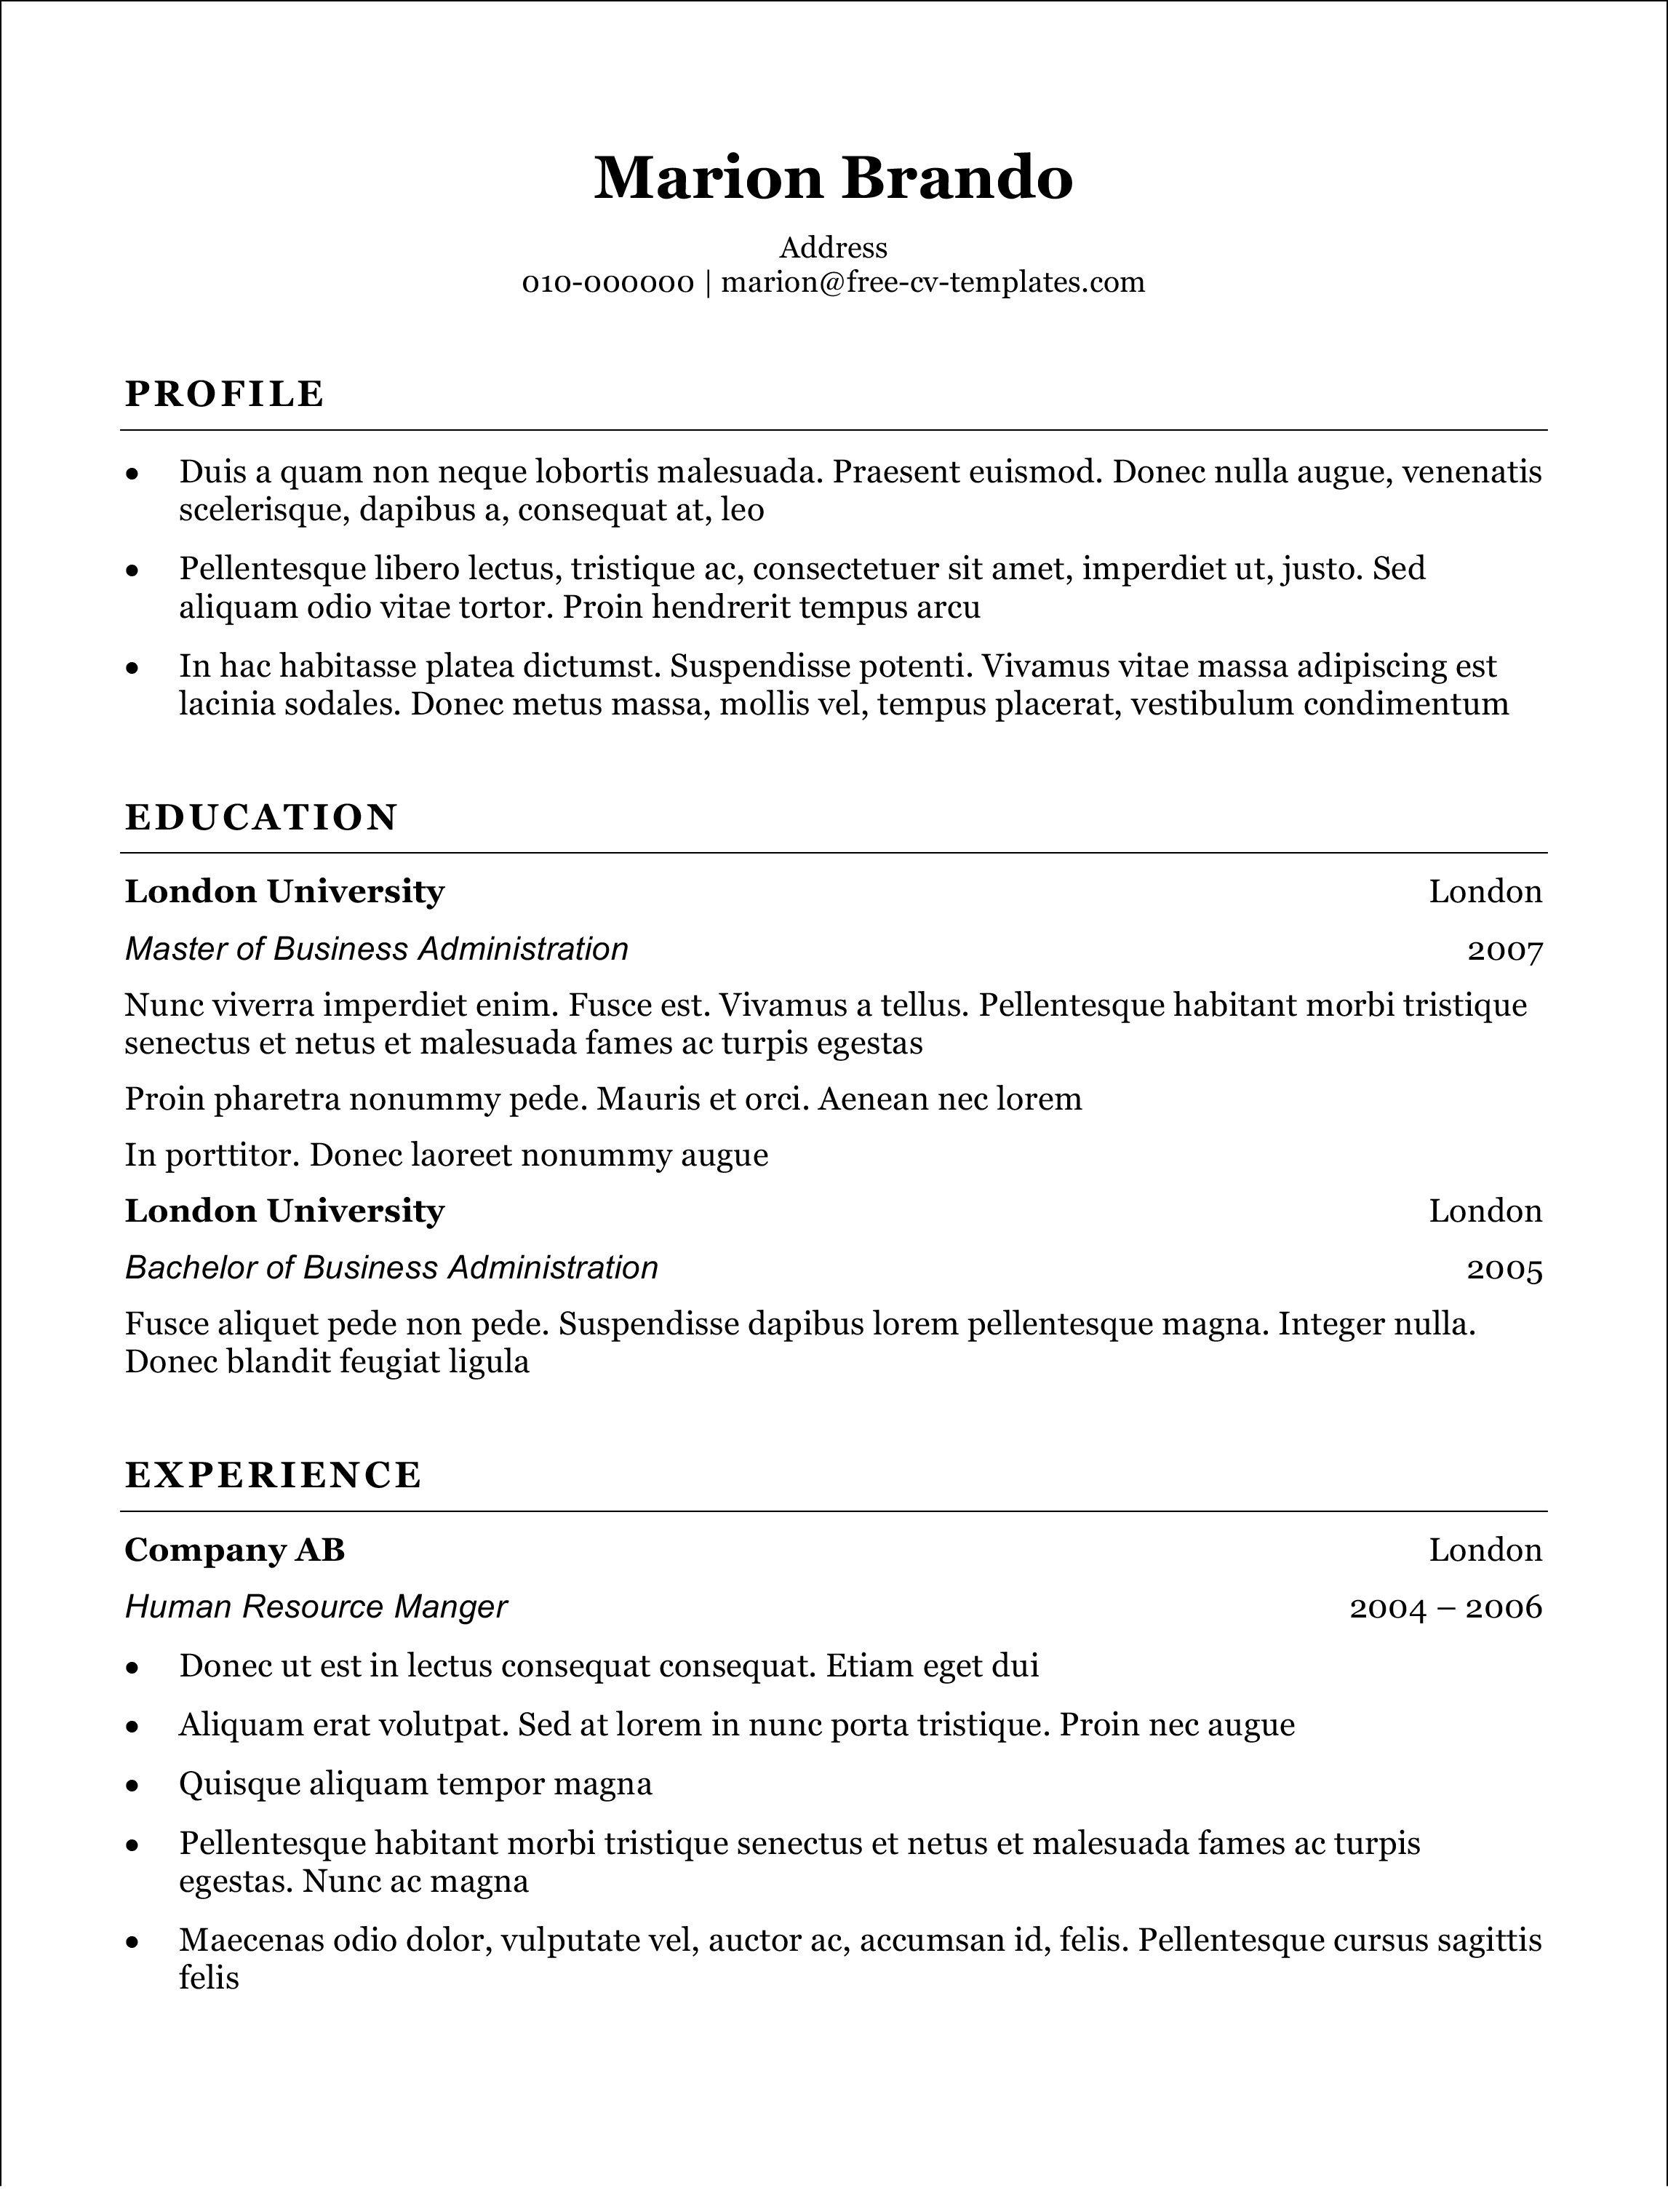 003 Singular Free Resume Template Microsoft Office Word 2007 Image Full